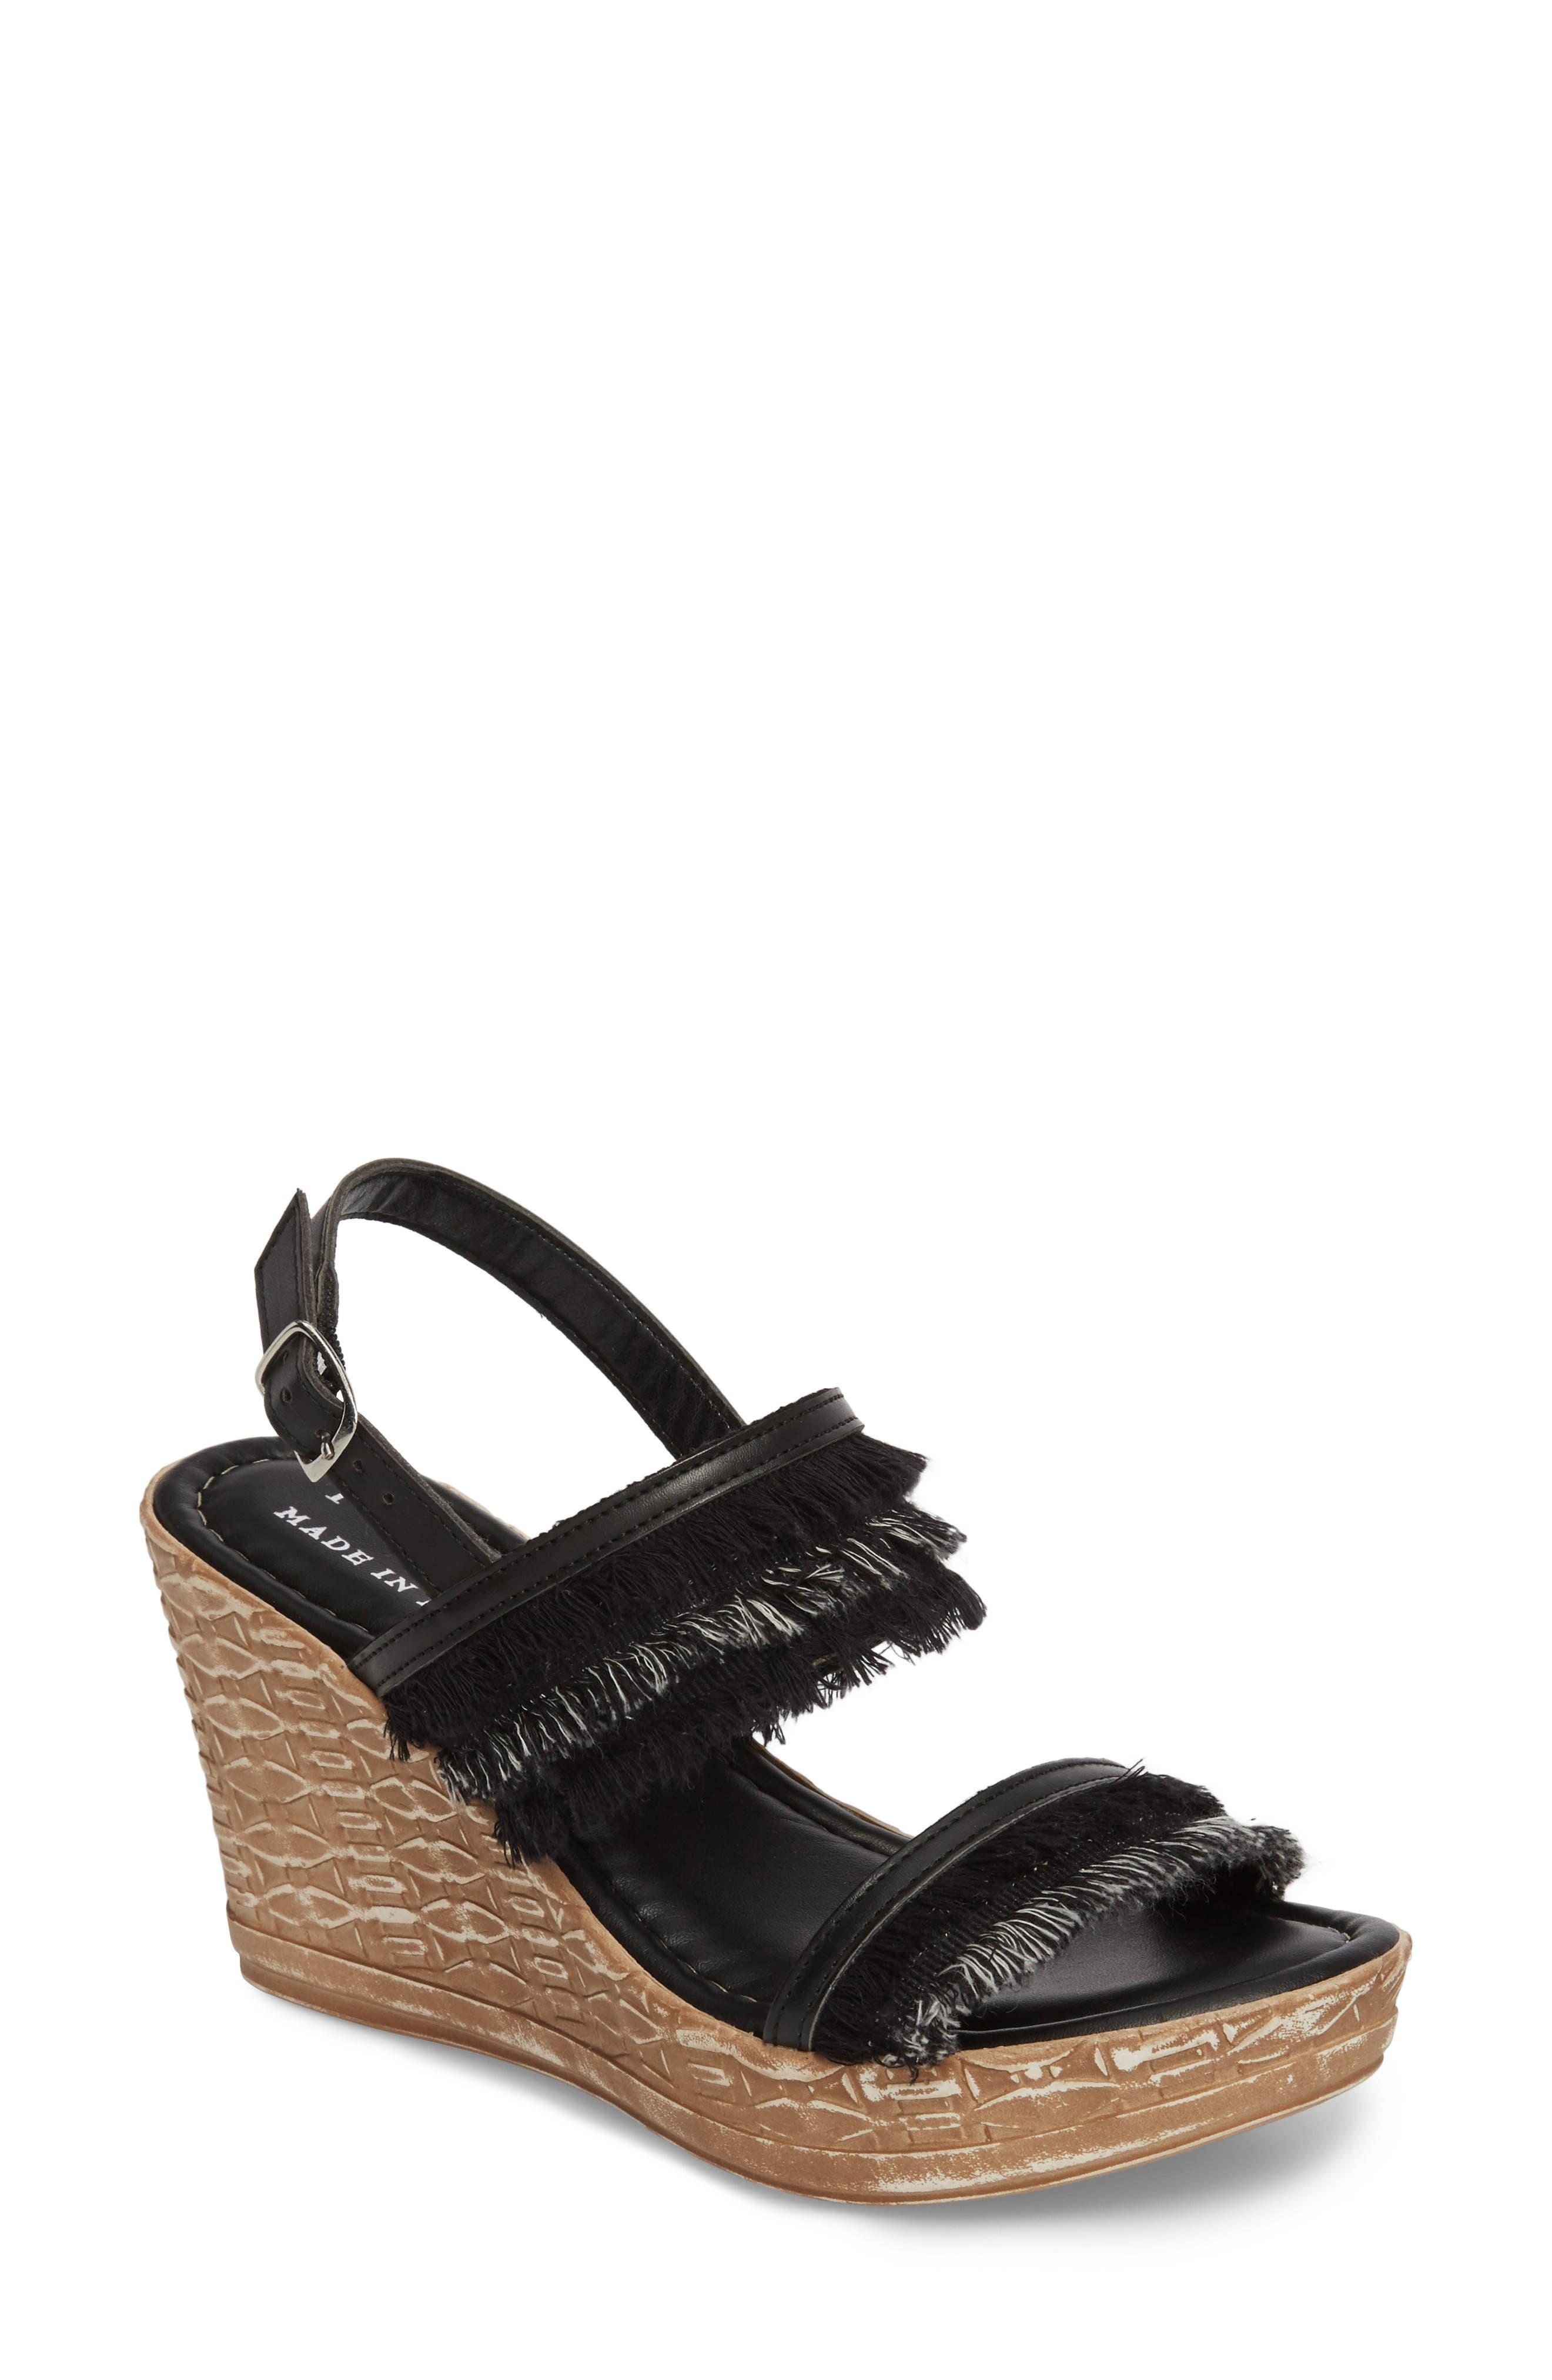 Zaira Wedge Espadrille Sandal,                         Main,                         color, BLACK FAUX LEATHER